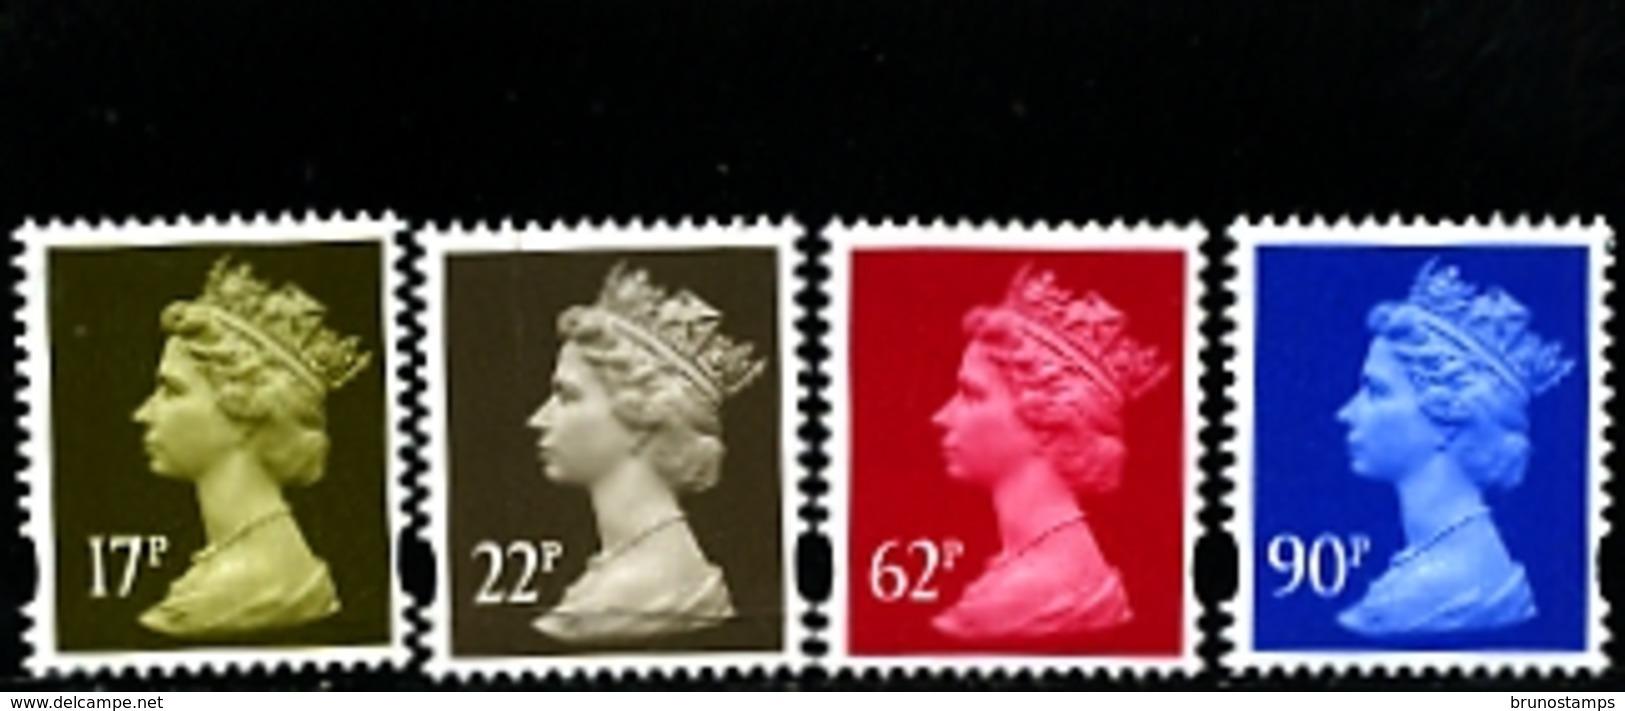 GREAT BRITAIN - 2009  MACHIN  17p+22p+62p+90p   SET  MINT NH - 1952-.... (Elisabetta II)